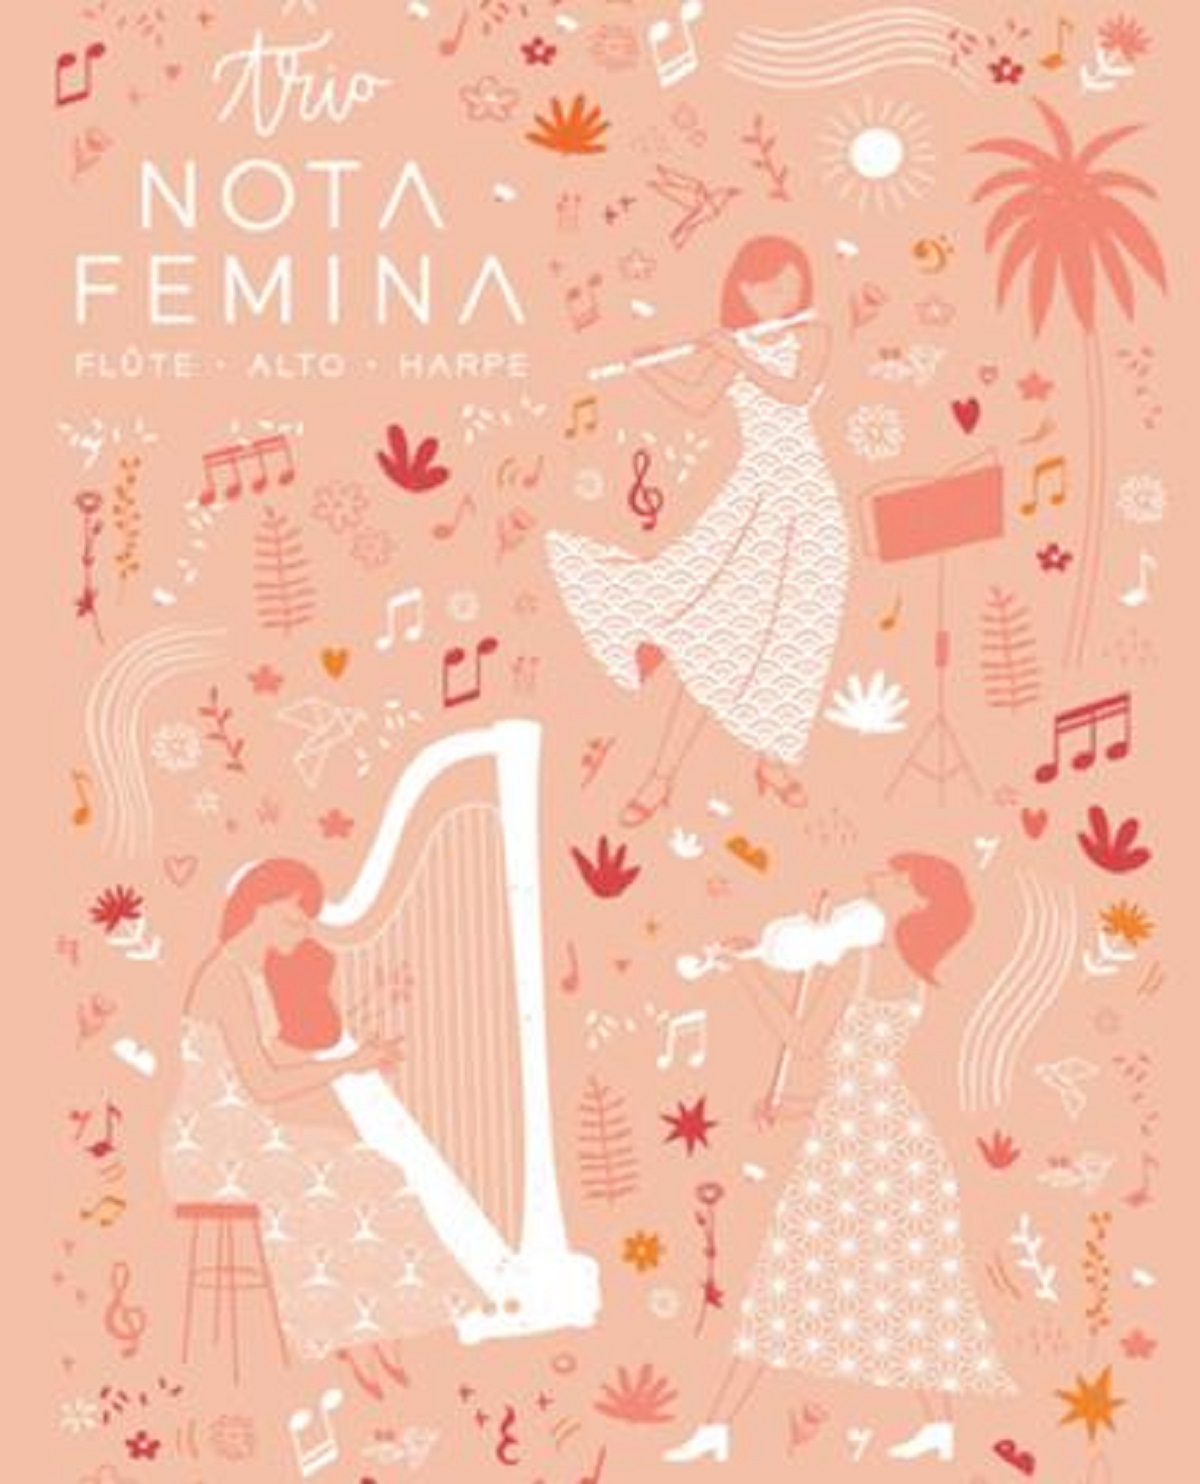 Concert :  Arc en cello I Trio Nota Femina - Et bien dansez maintenant !